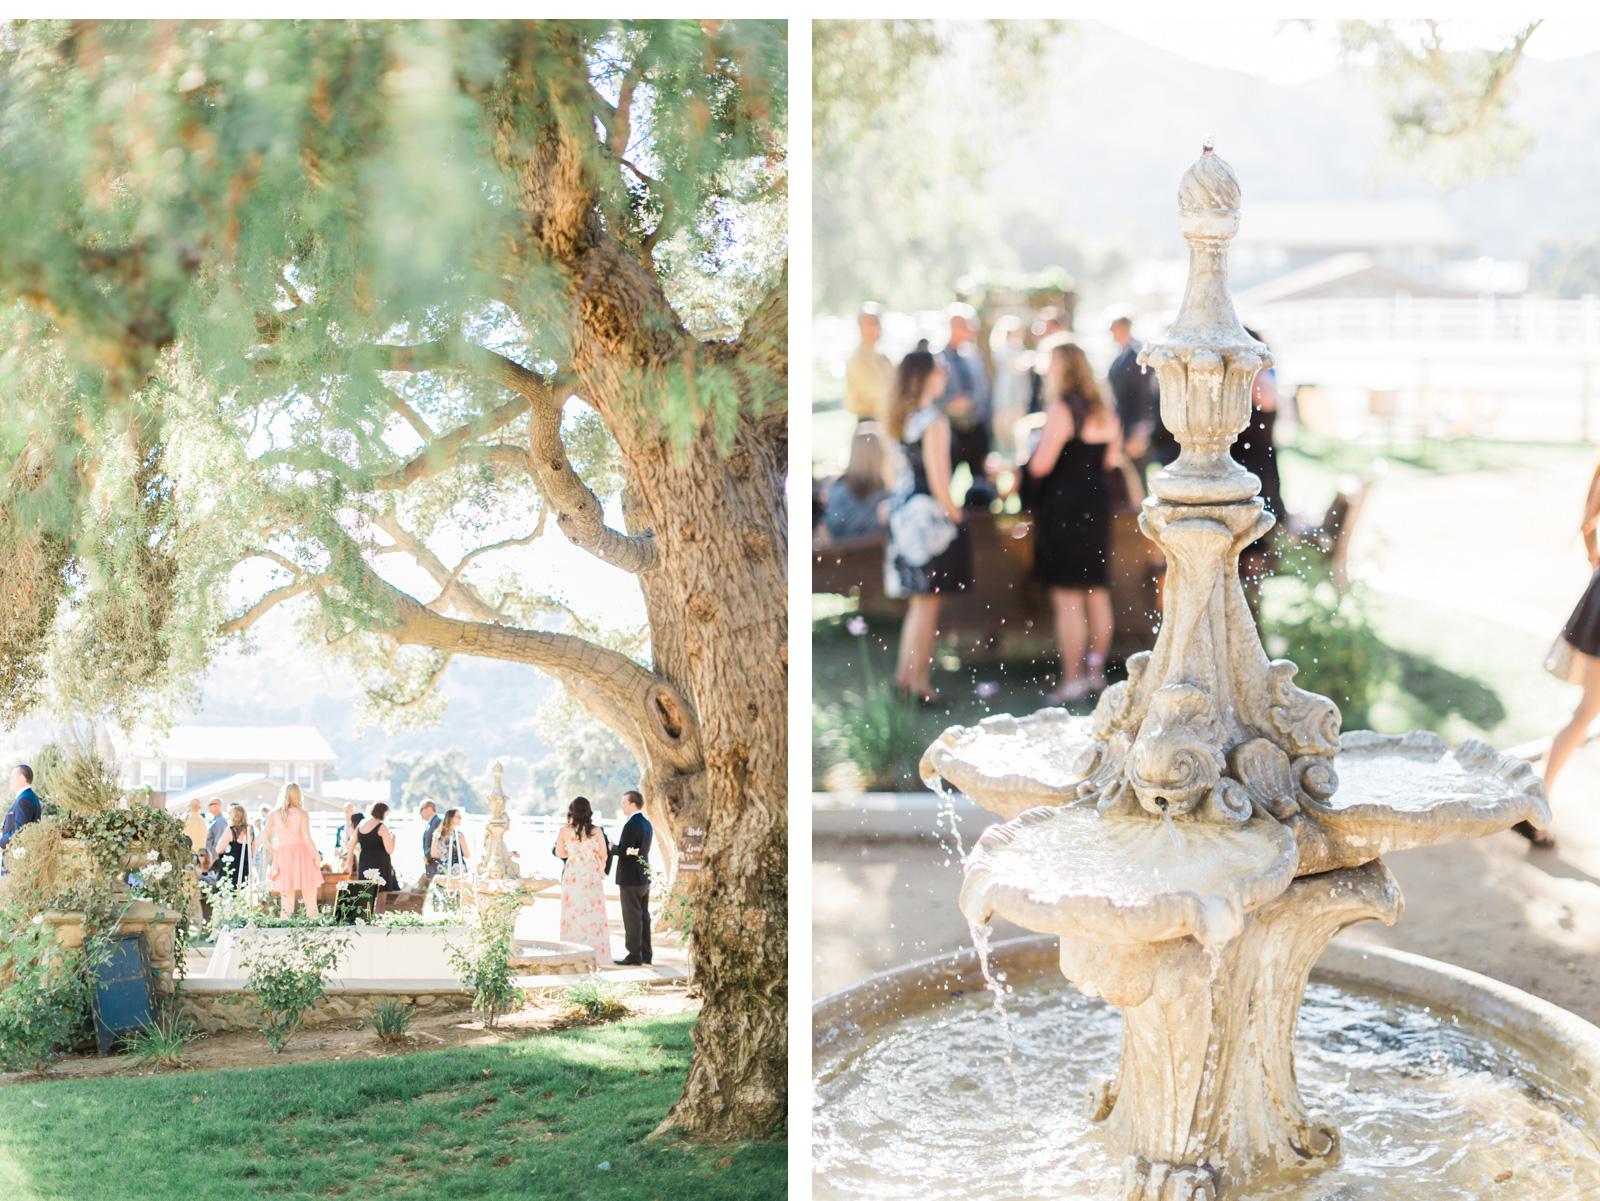 Triunfo-Orange-County-Temecula-Wedding-Photographer-Style-Me-Pretty-Natalie-Schutt-Photography_08.jpg